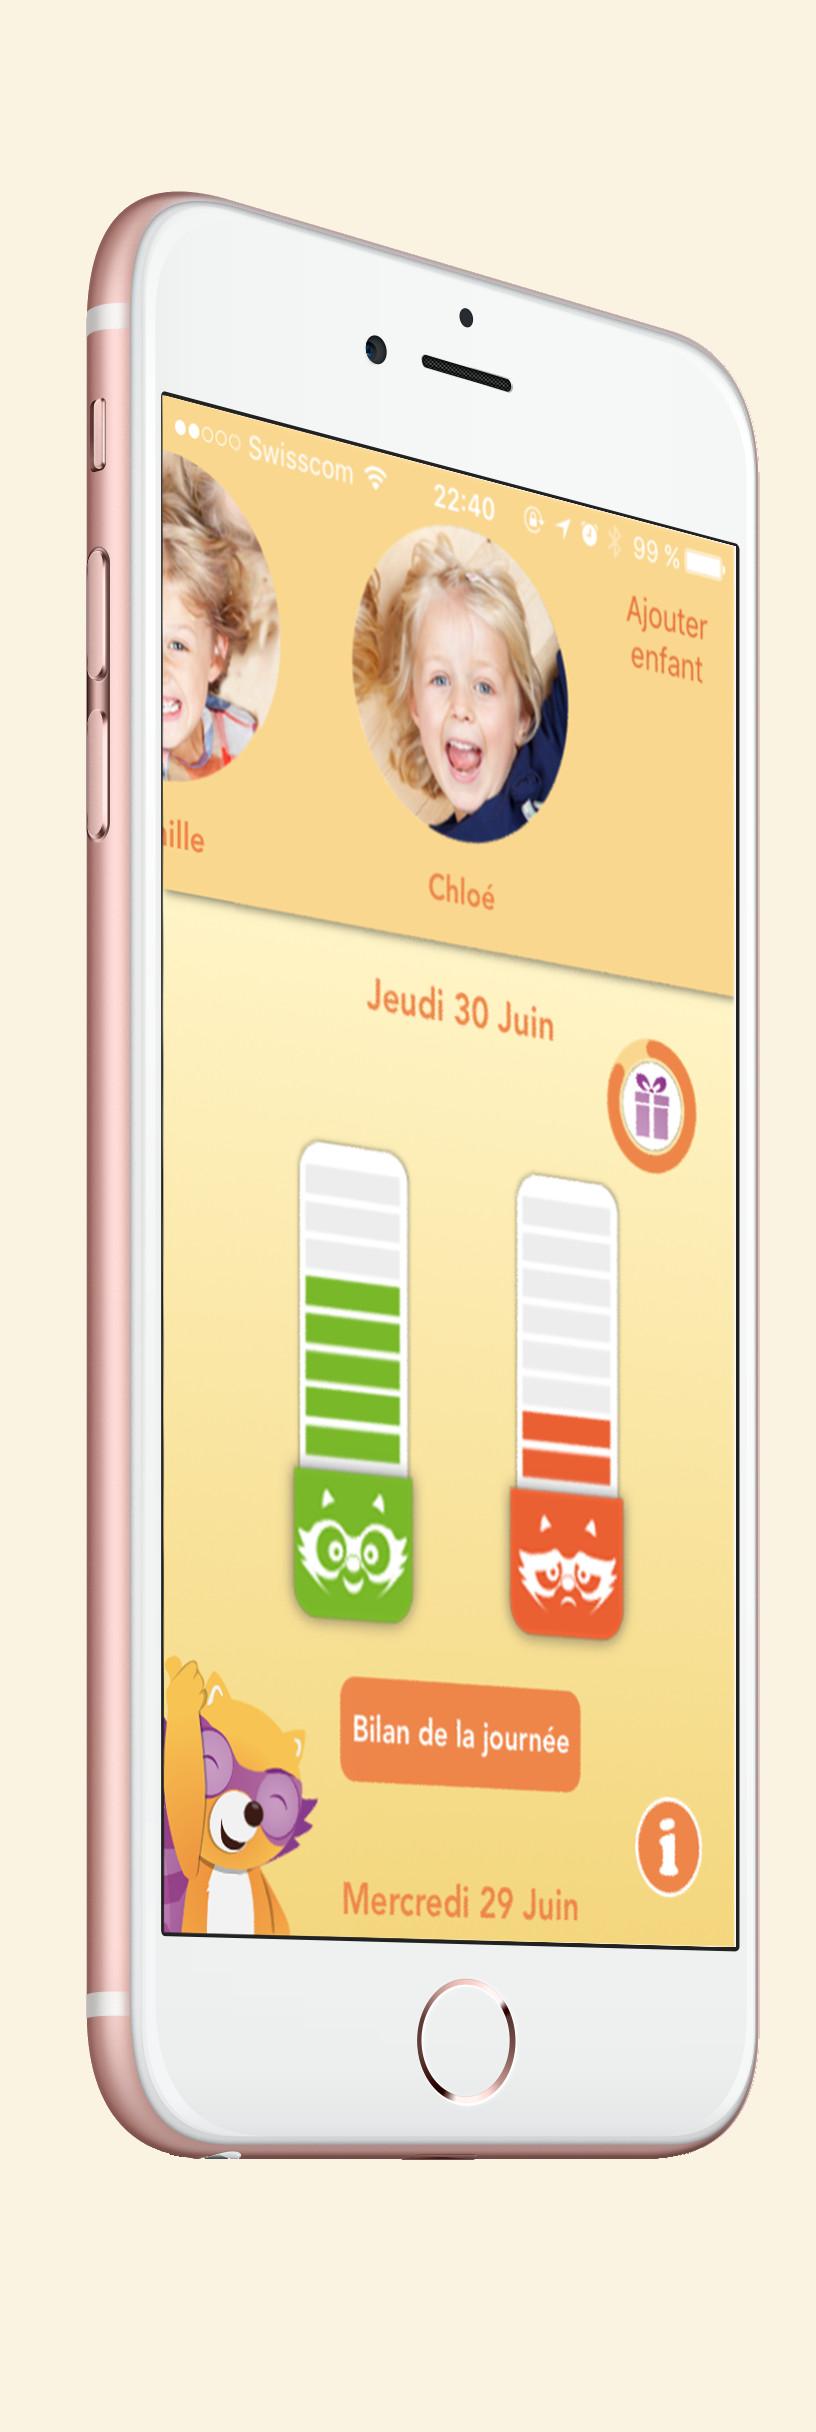 ecran Iphone6 menu principal